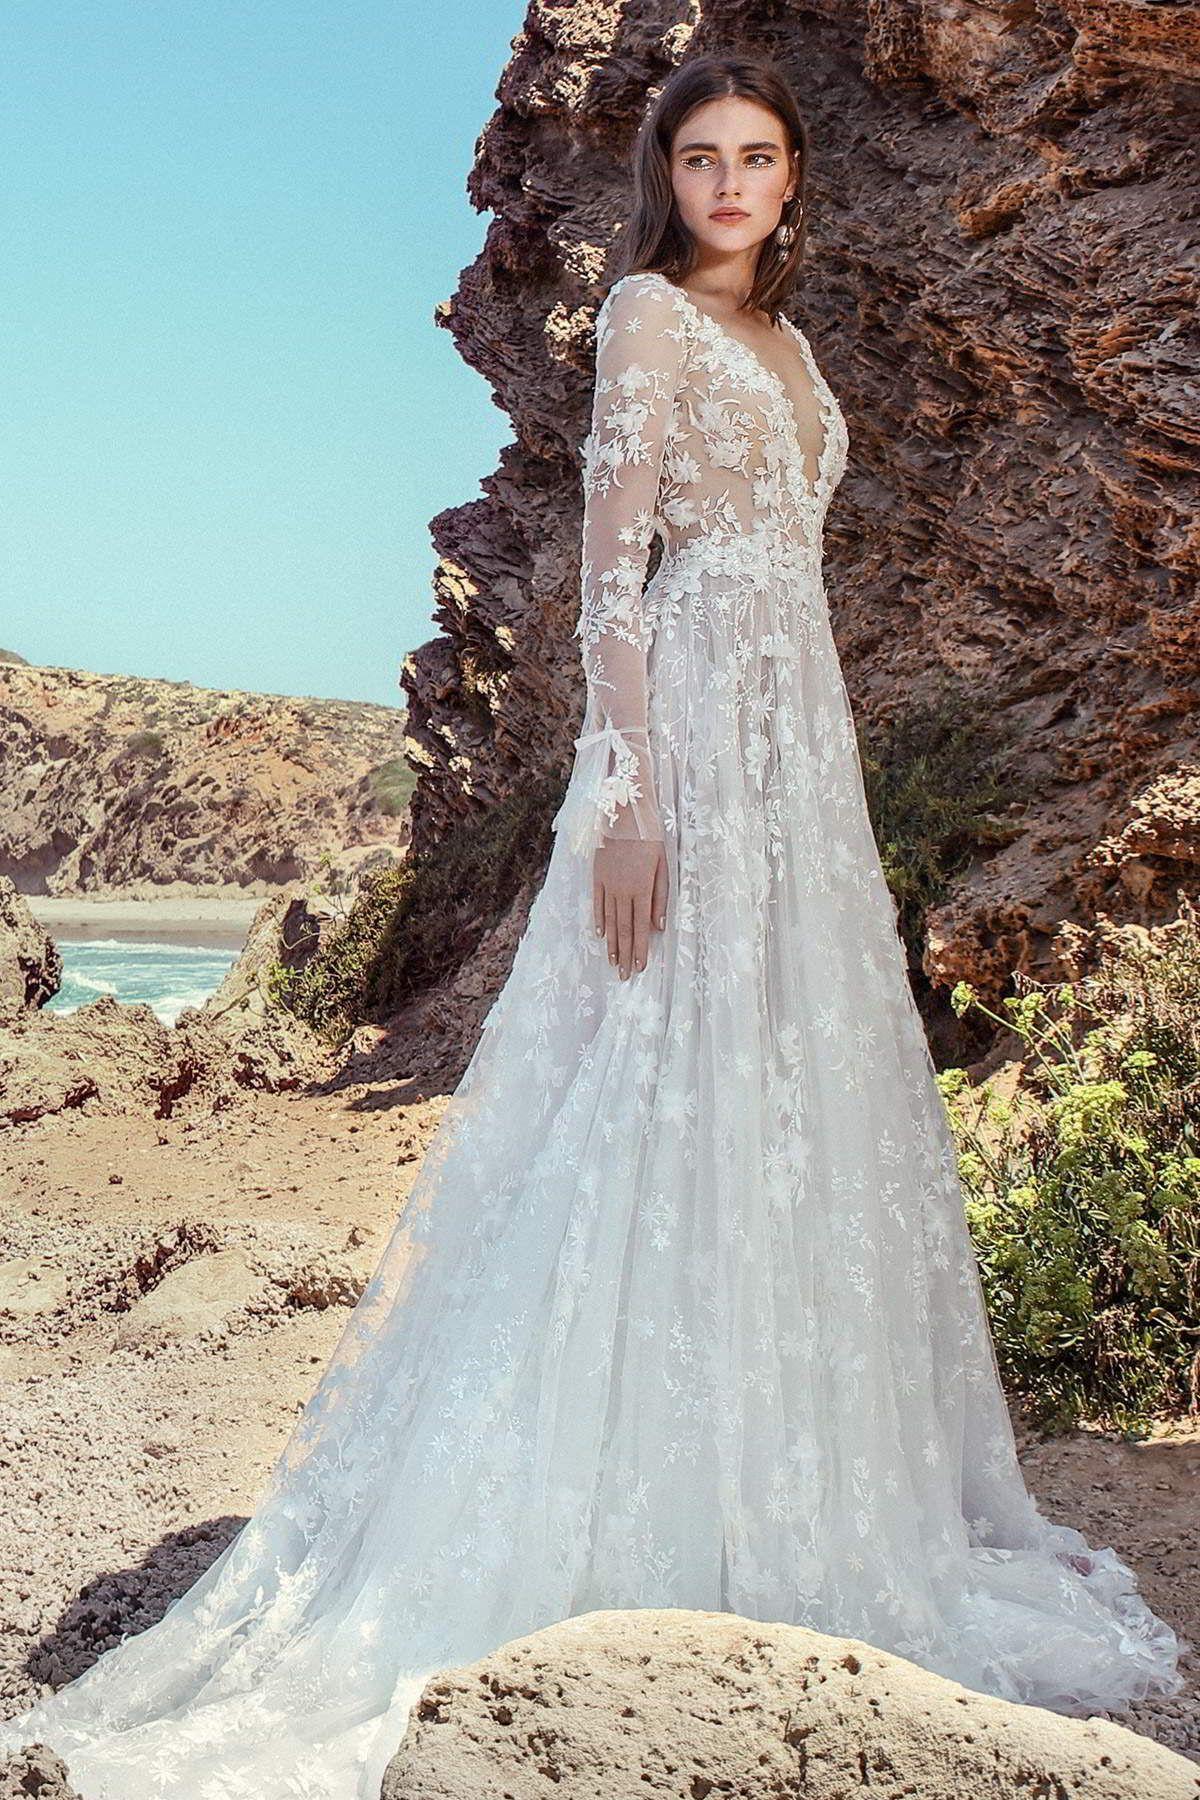 These Gala By Galia Lahav No Ix Wedding Dresses Will Have You Spellbound Wedding Inspirasi Wedding Dress Guide Wedding Dress Trends Wedding Dresses